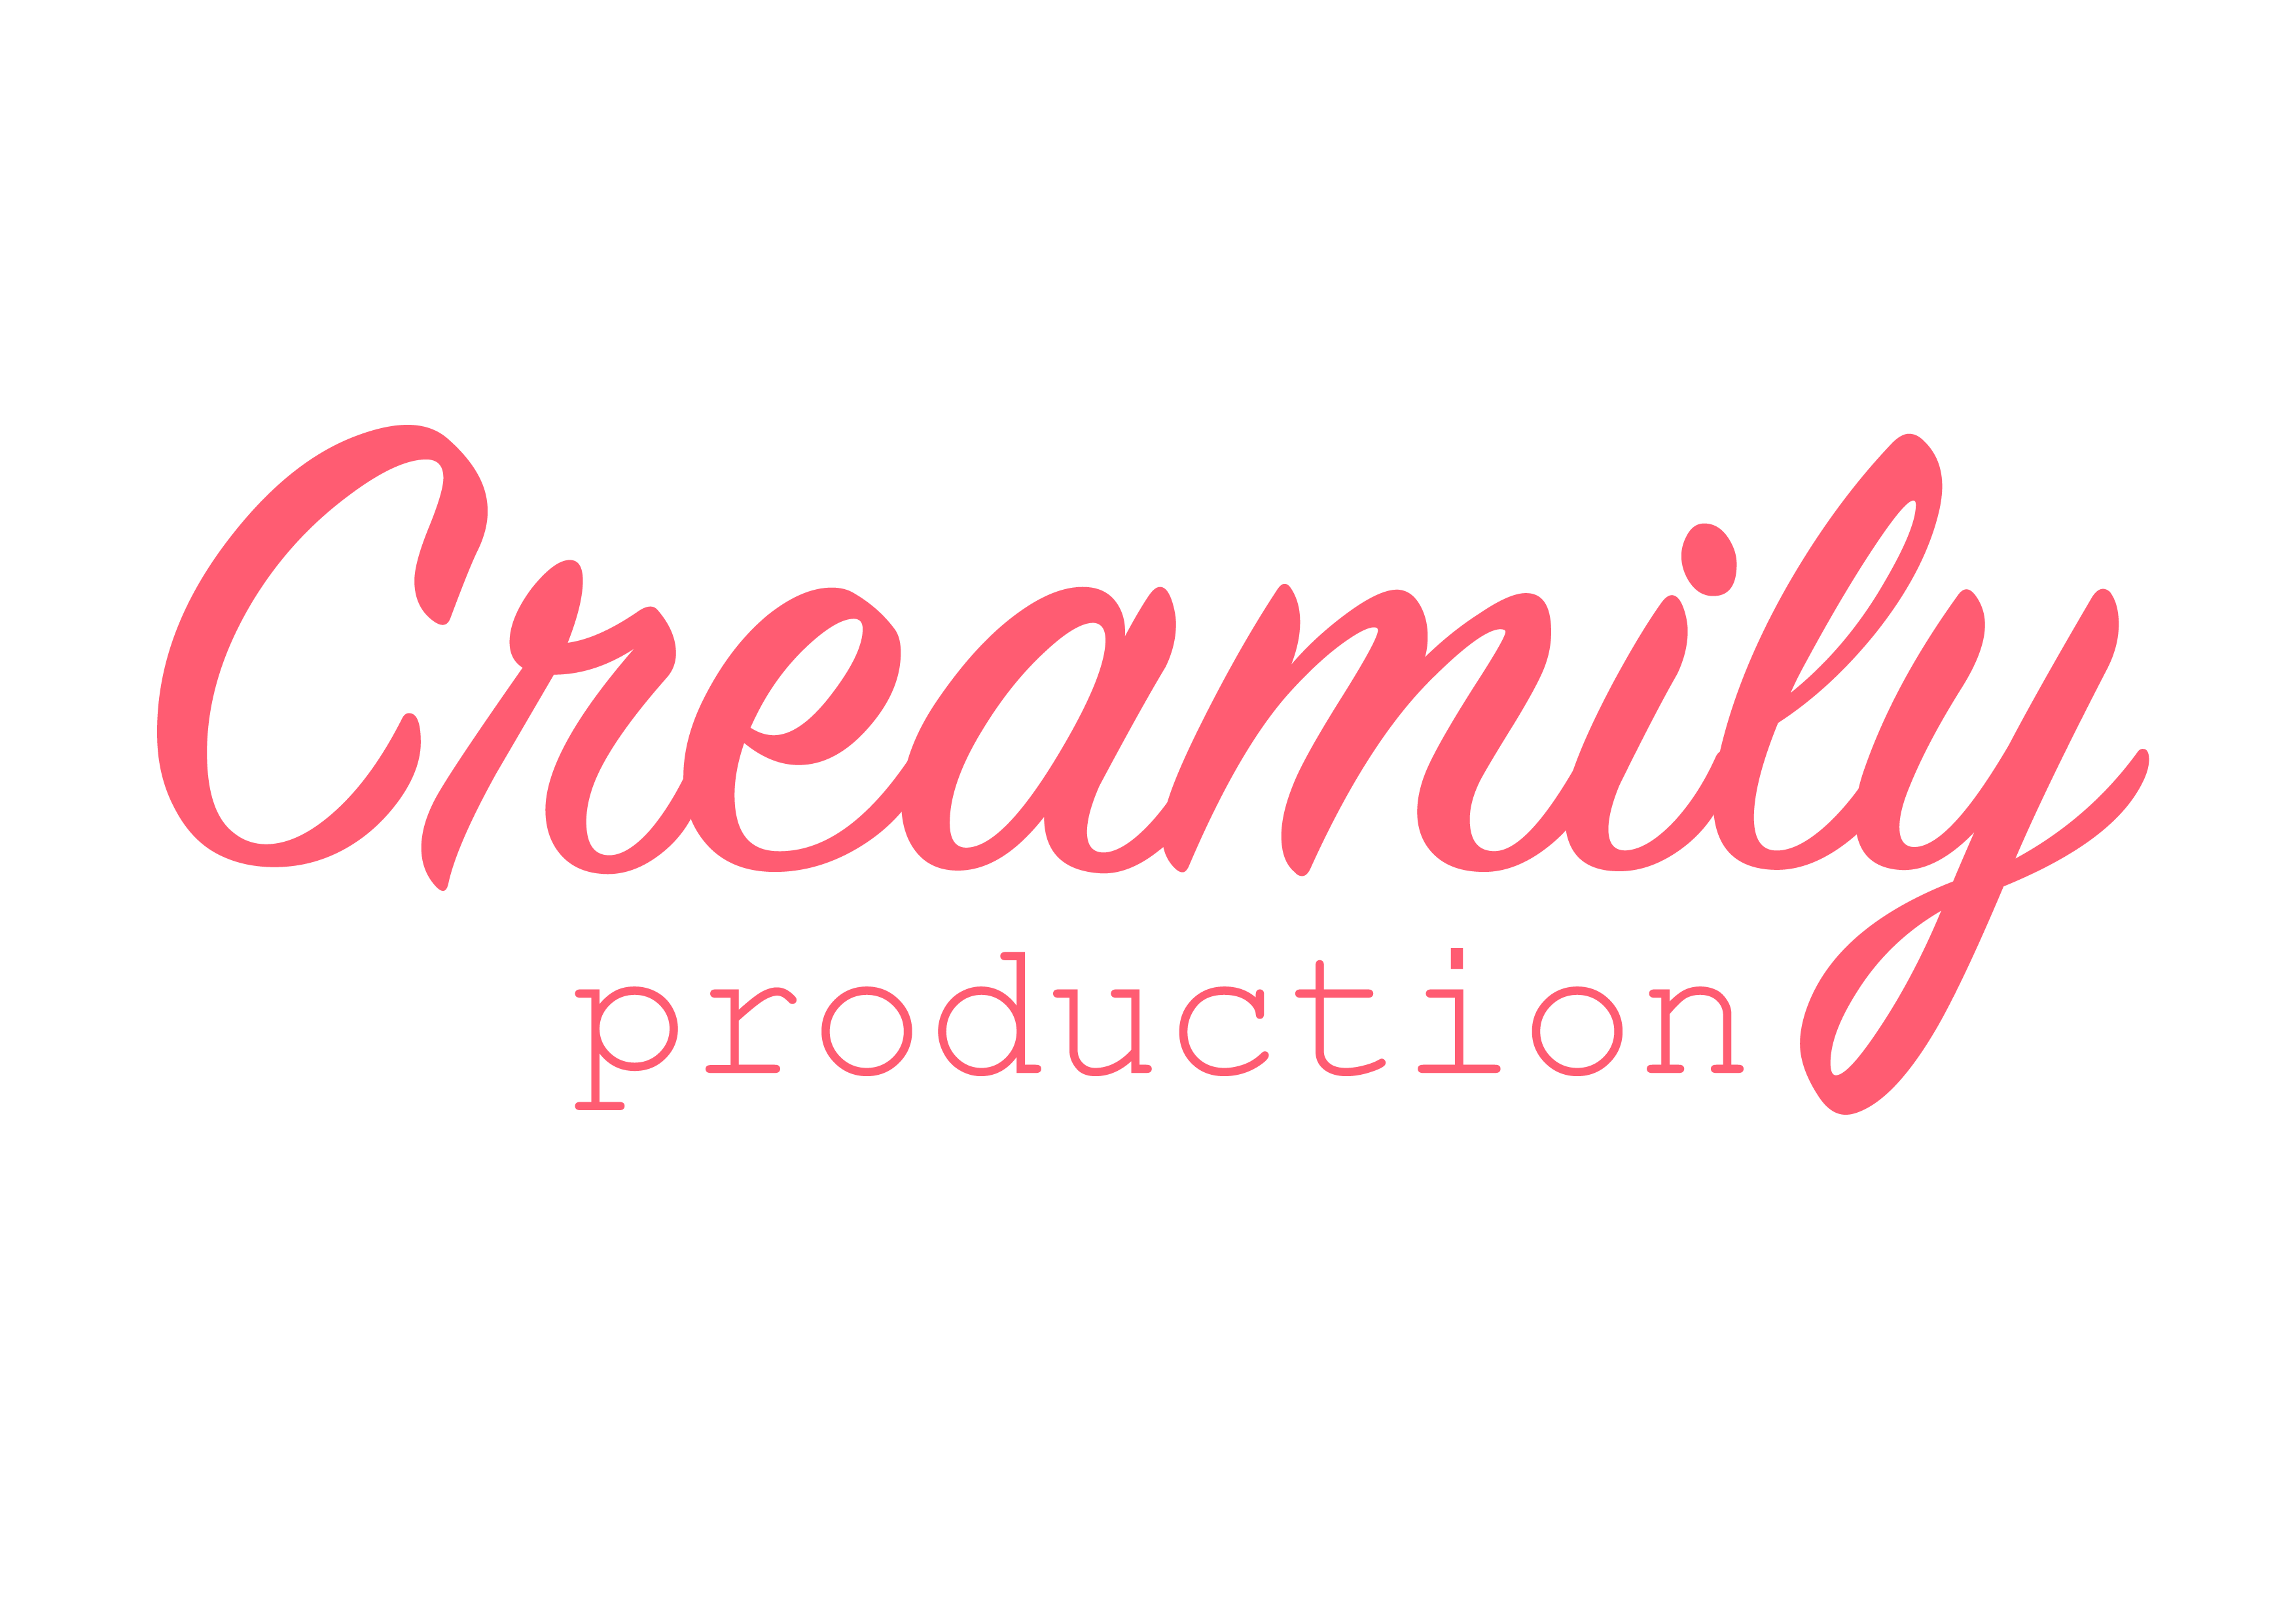 Creamily production